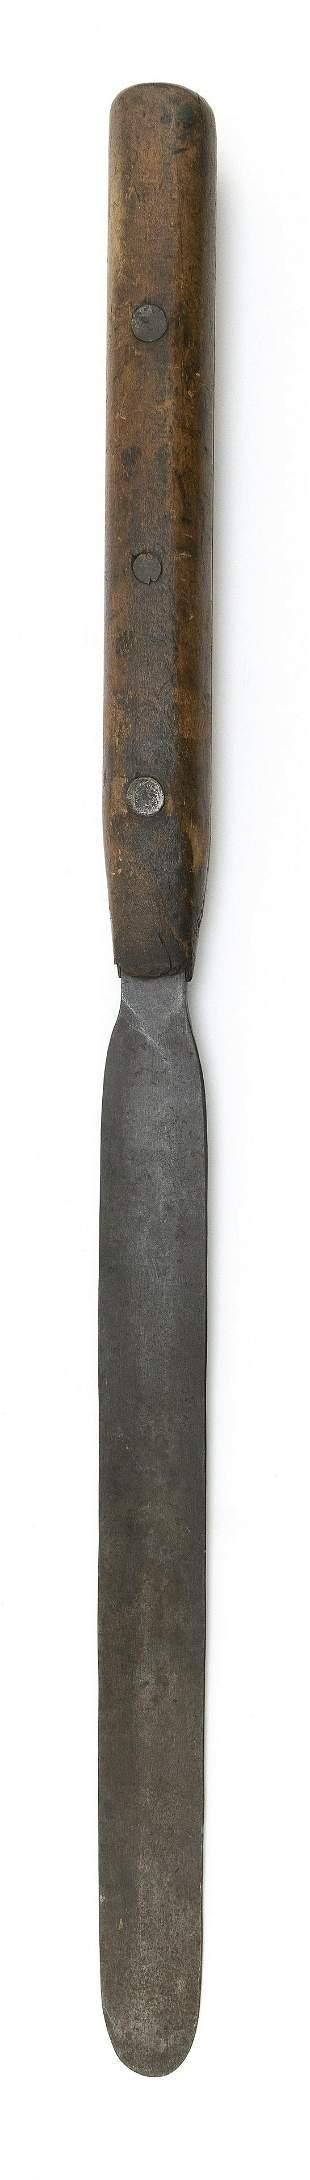 STEEL FLENSING KNIFE